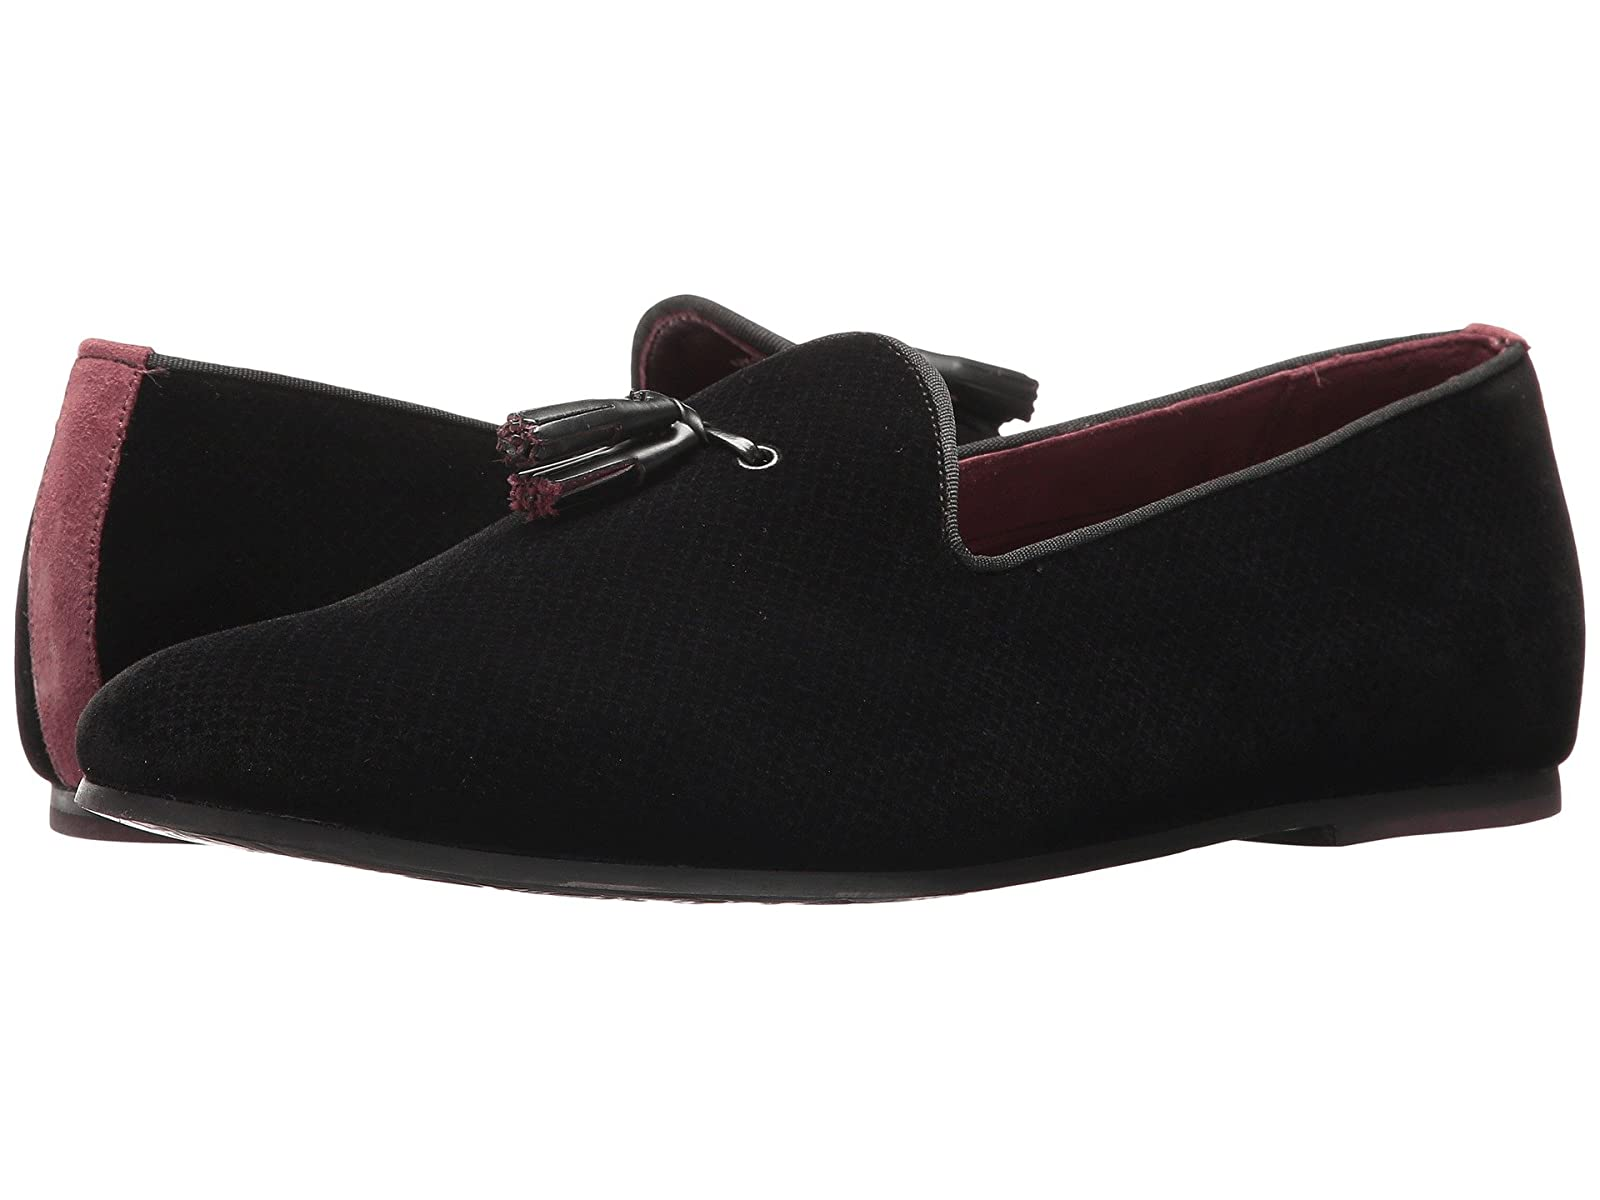 Ted Baker VardahAtmospheric grades have affordable shoes